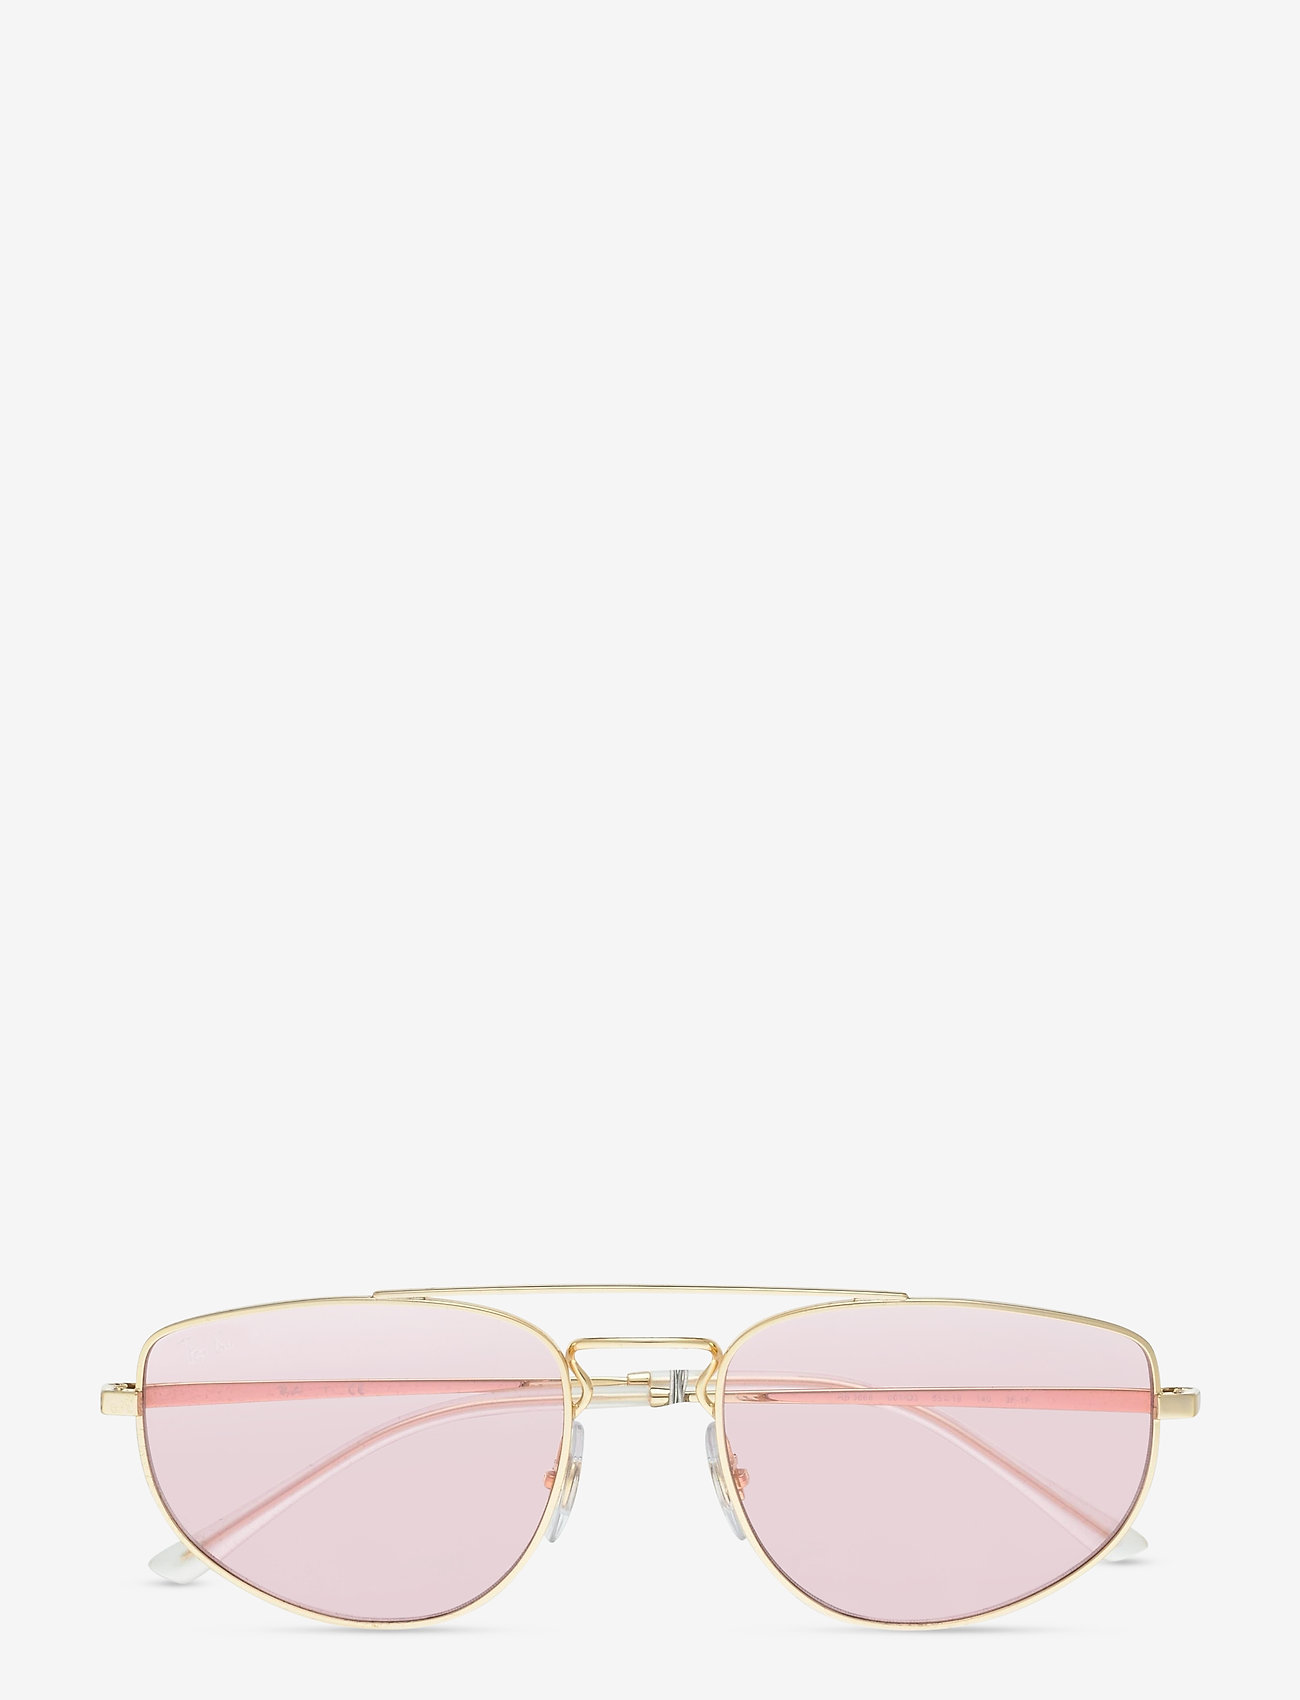 Ray-Ban - Sunglasses - pilot - evolve photo pink to blue - 0